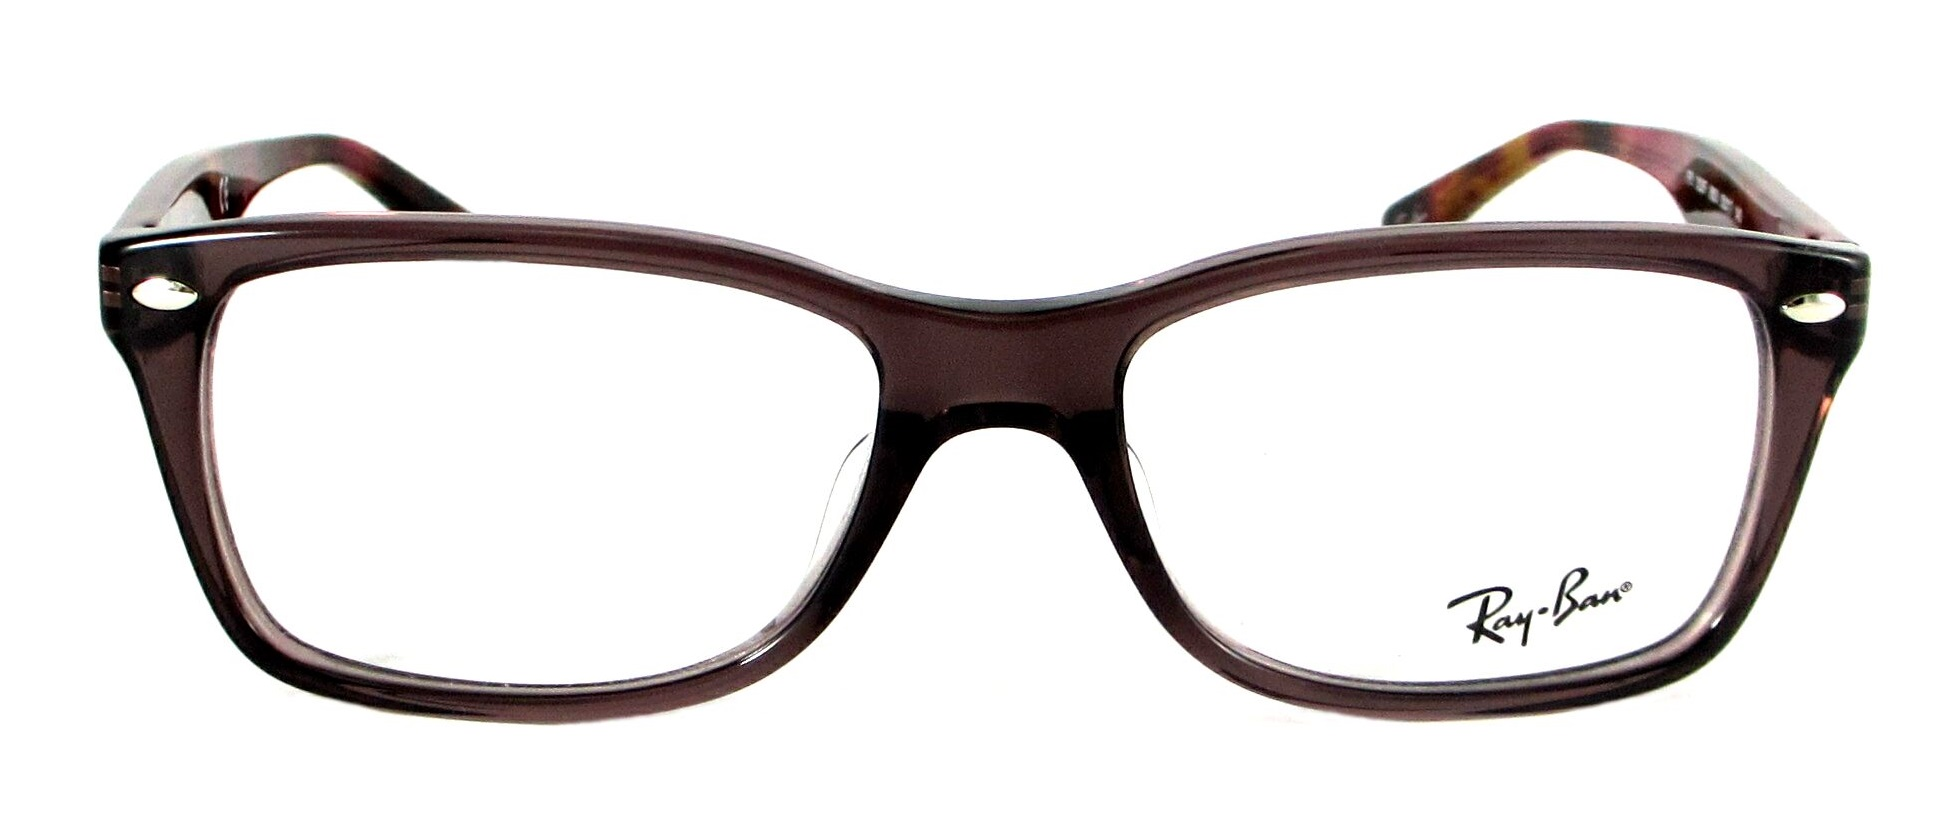 lunettes ray ban luxottica psychopraticienne bordeaux. Black Bedroom Furniture Sets. Home Design Ideas